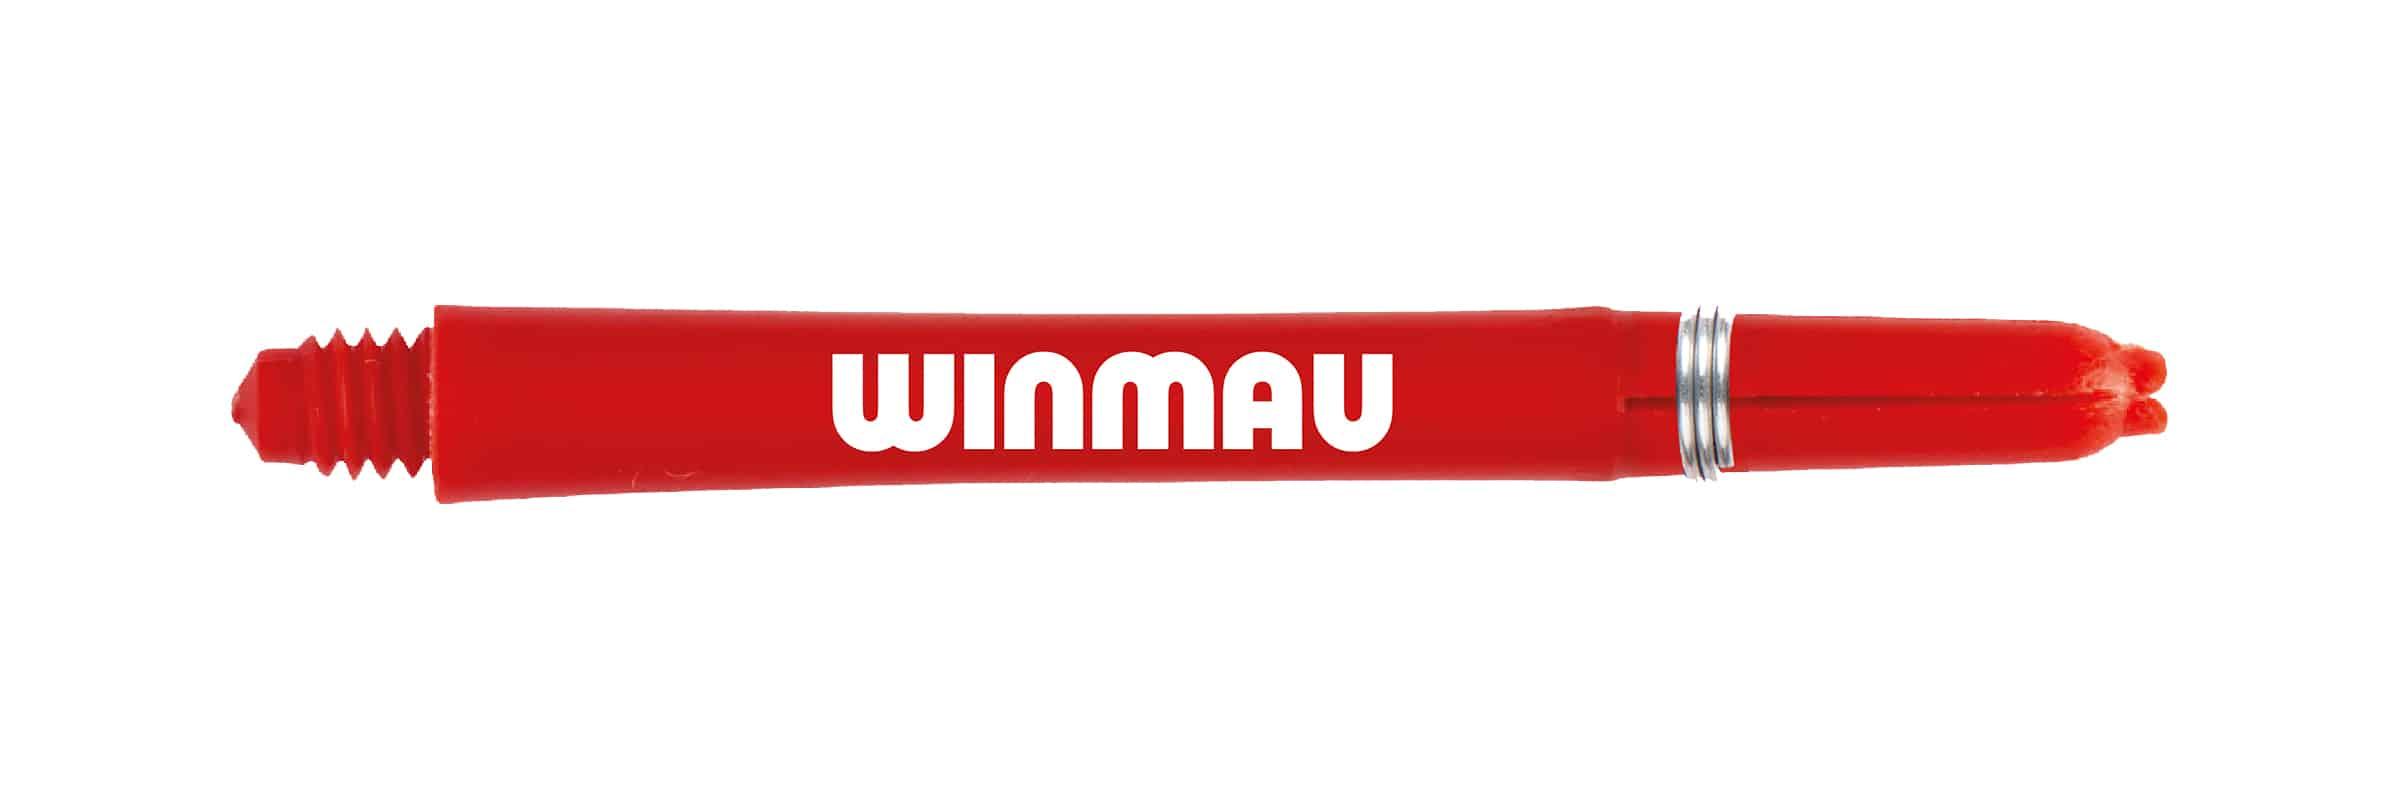 Winmau Signature Series Red Dart Stems